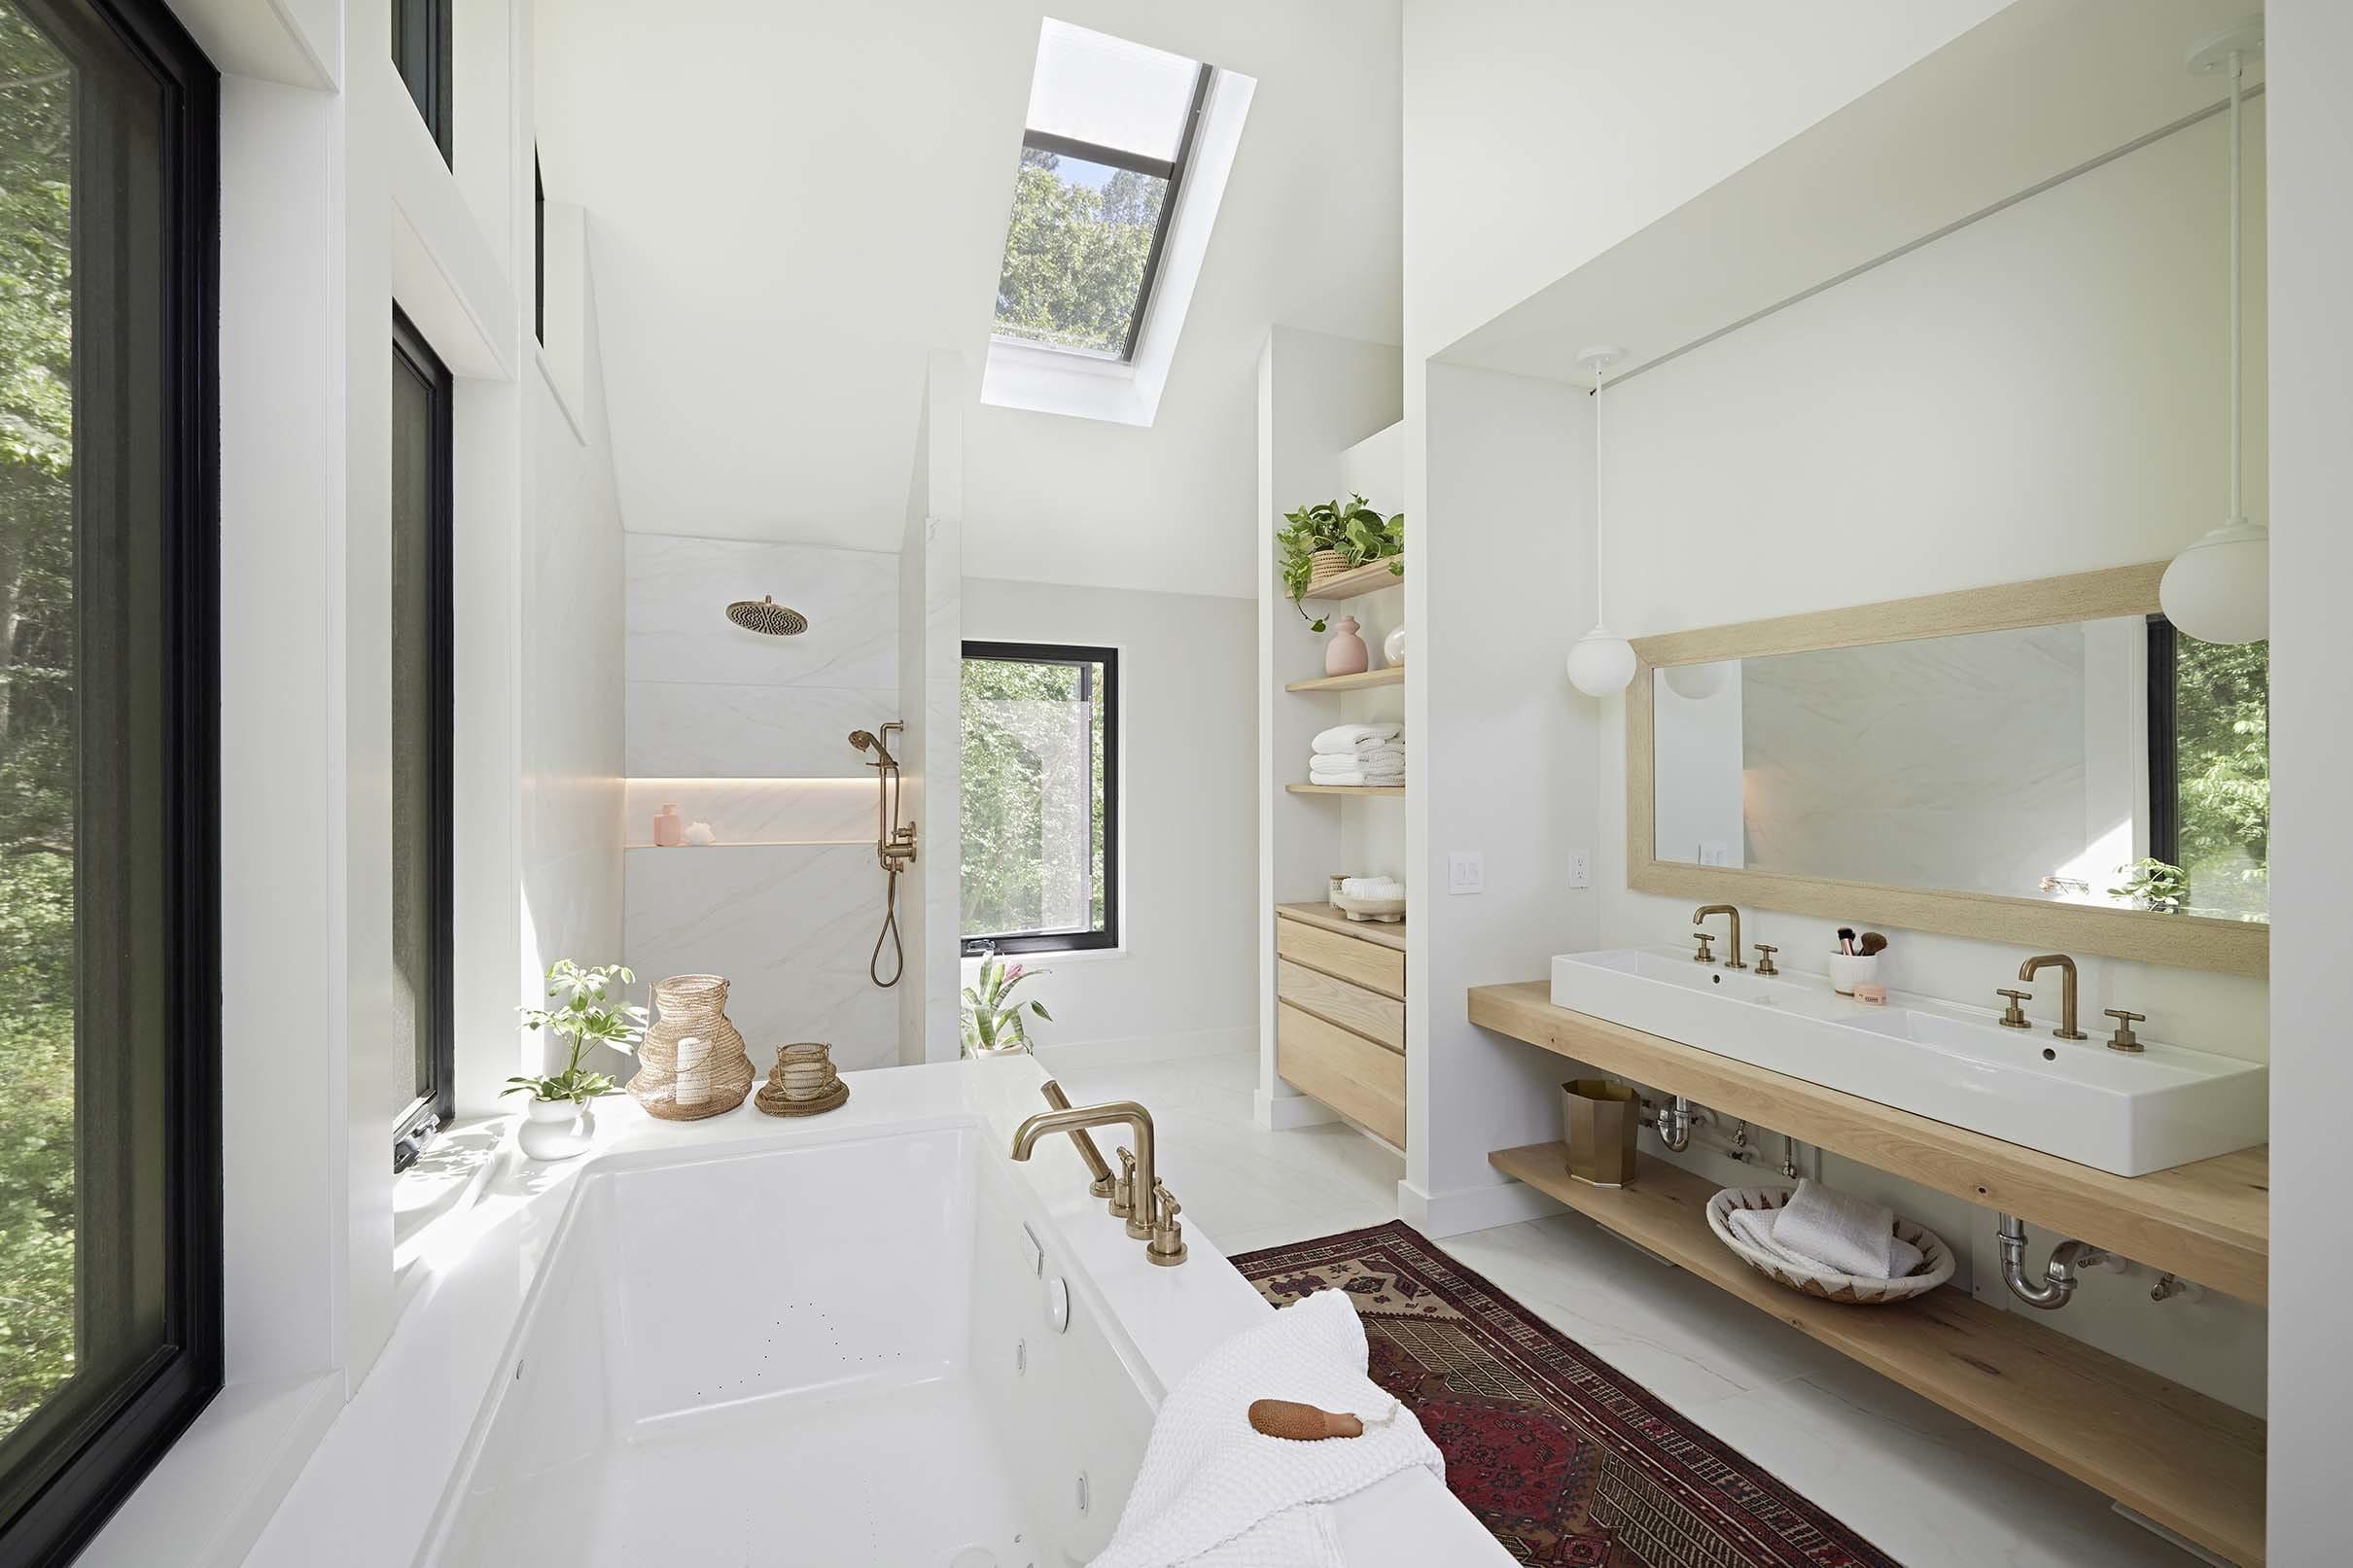 Bathroom skylight closed partial shades